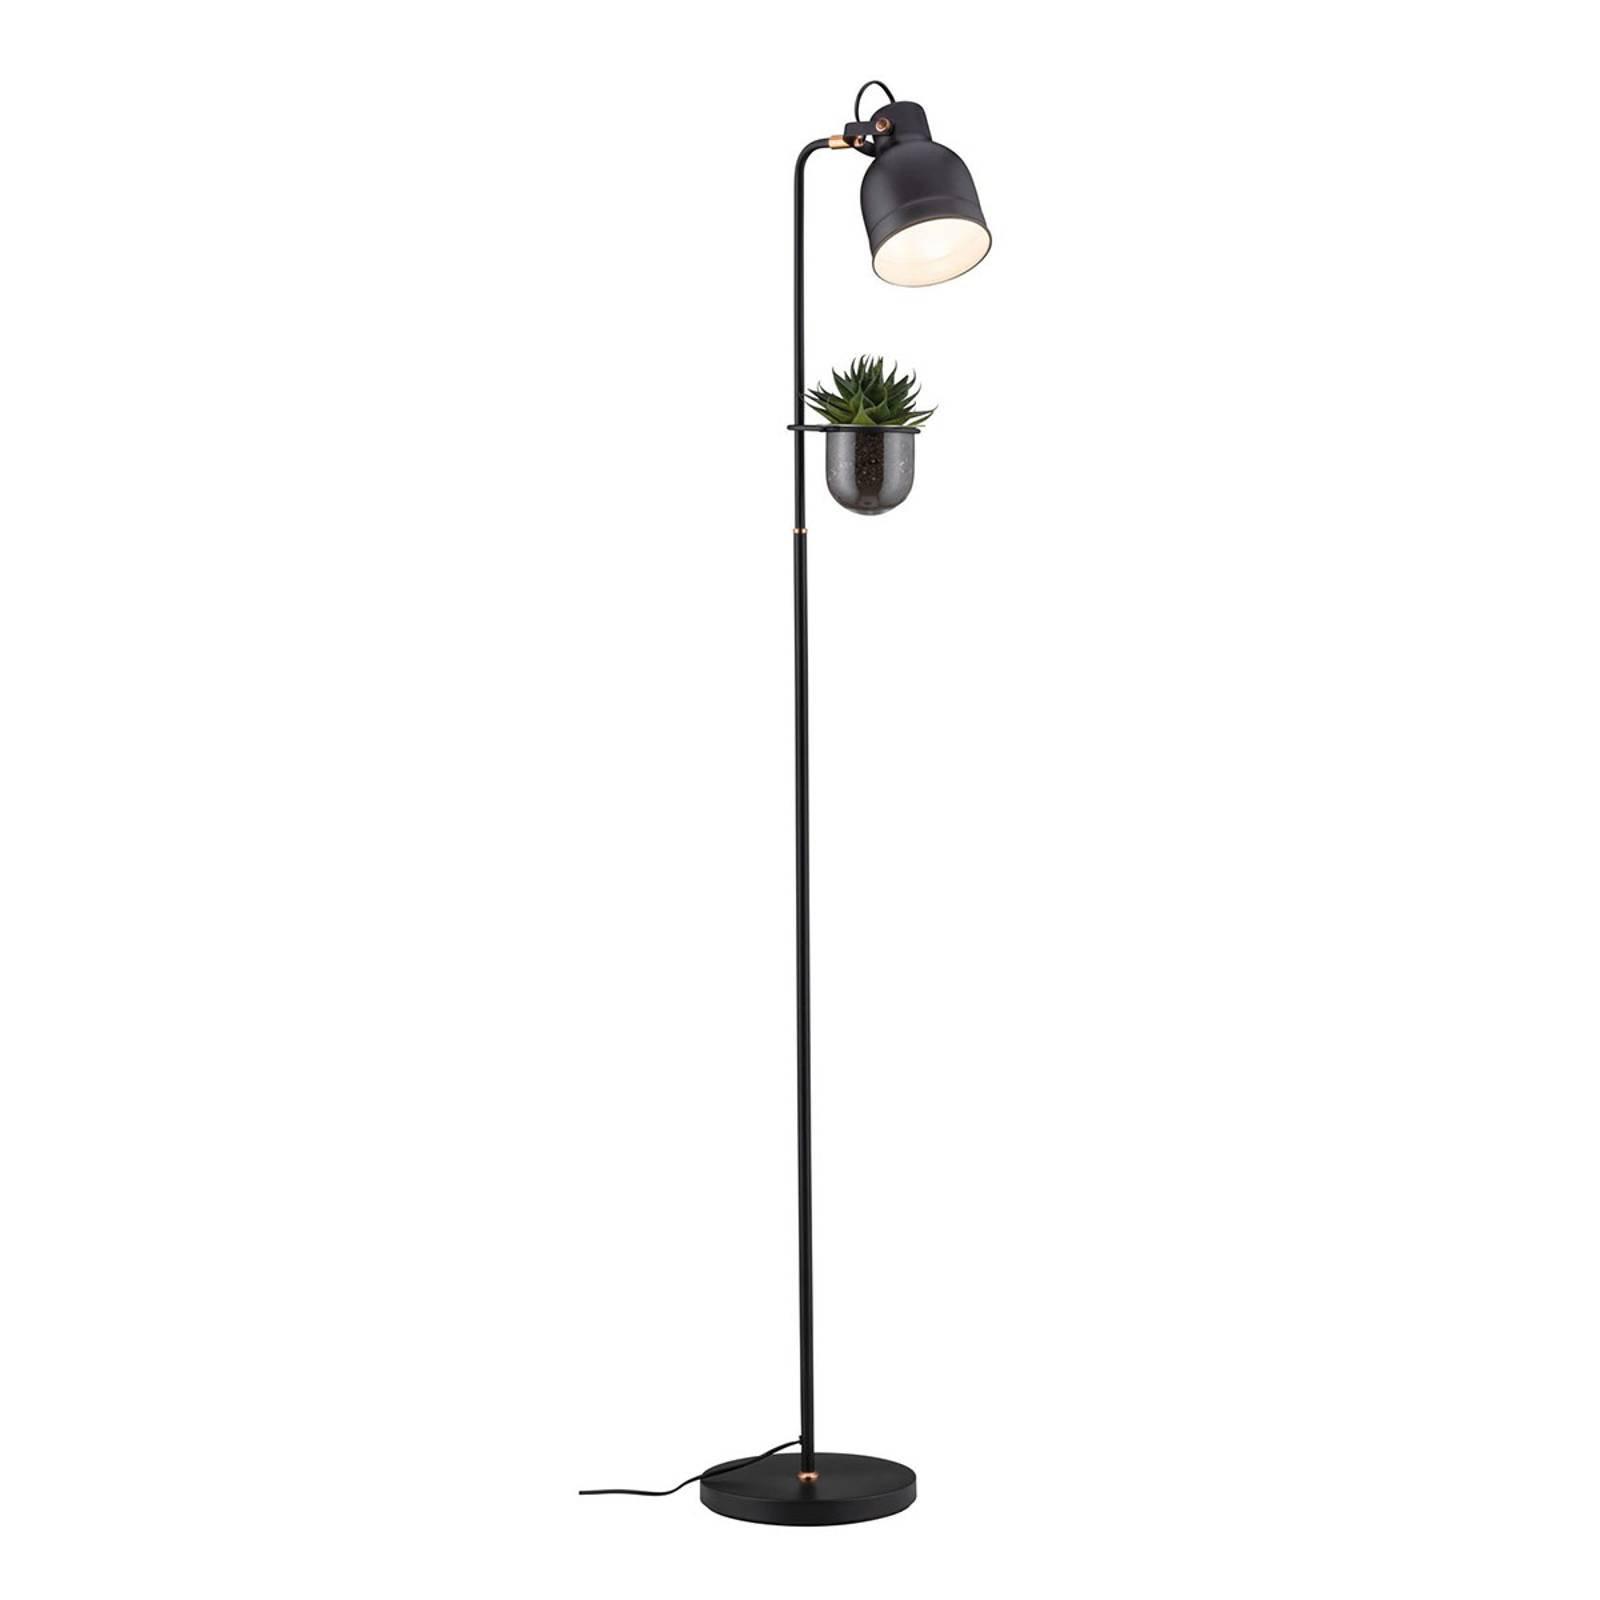 Paulmann gulvlampe Elric med plantepotte